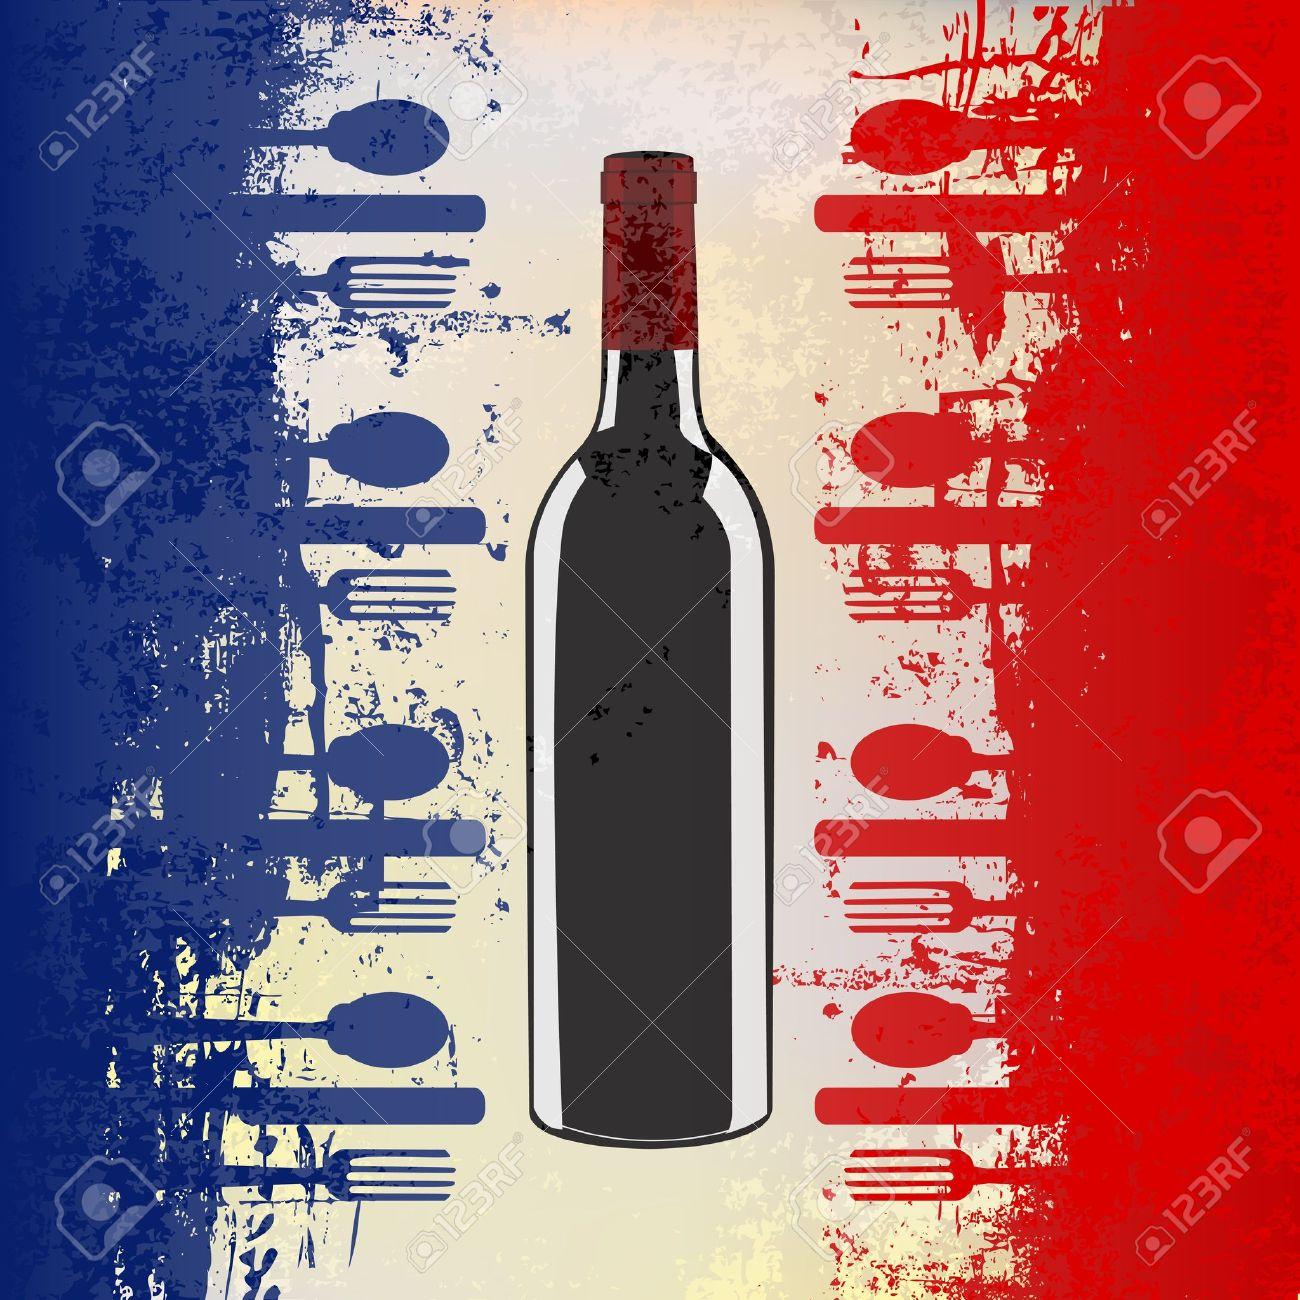 French Menu Template a Menu Template With a Wine